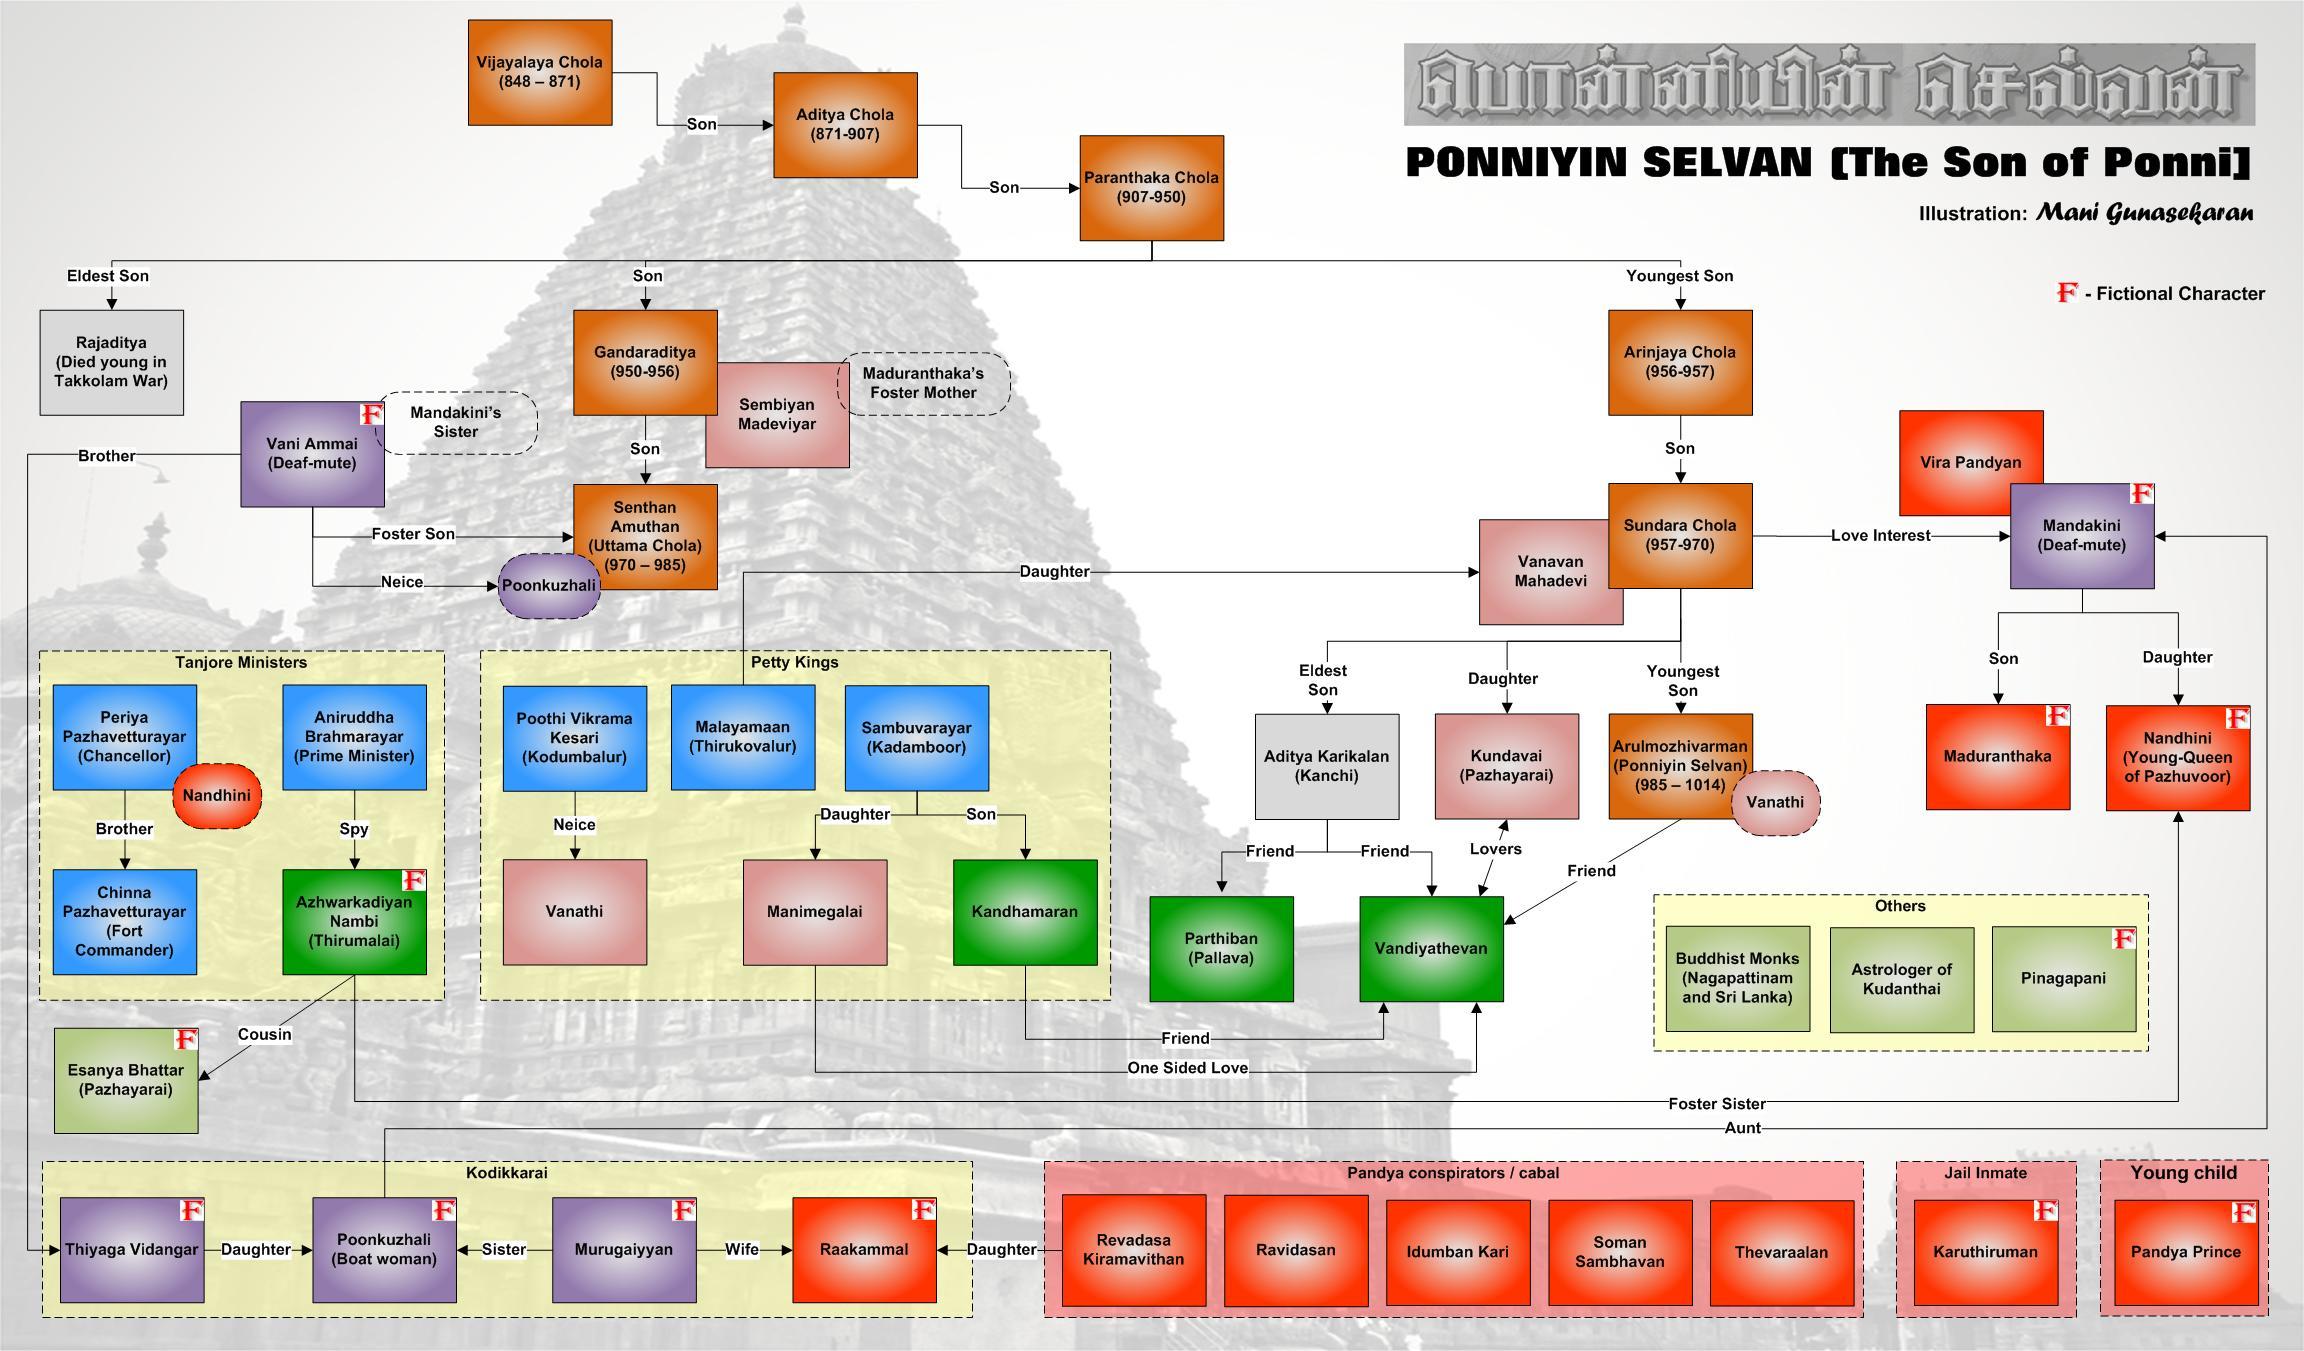 https://upload.wikimedia.org/wikipedia/commons/3/33/Ponniyin_Selvan_Family_Tree_English.jpg